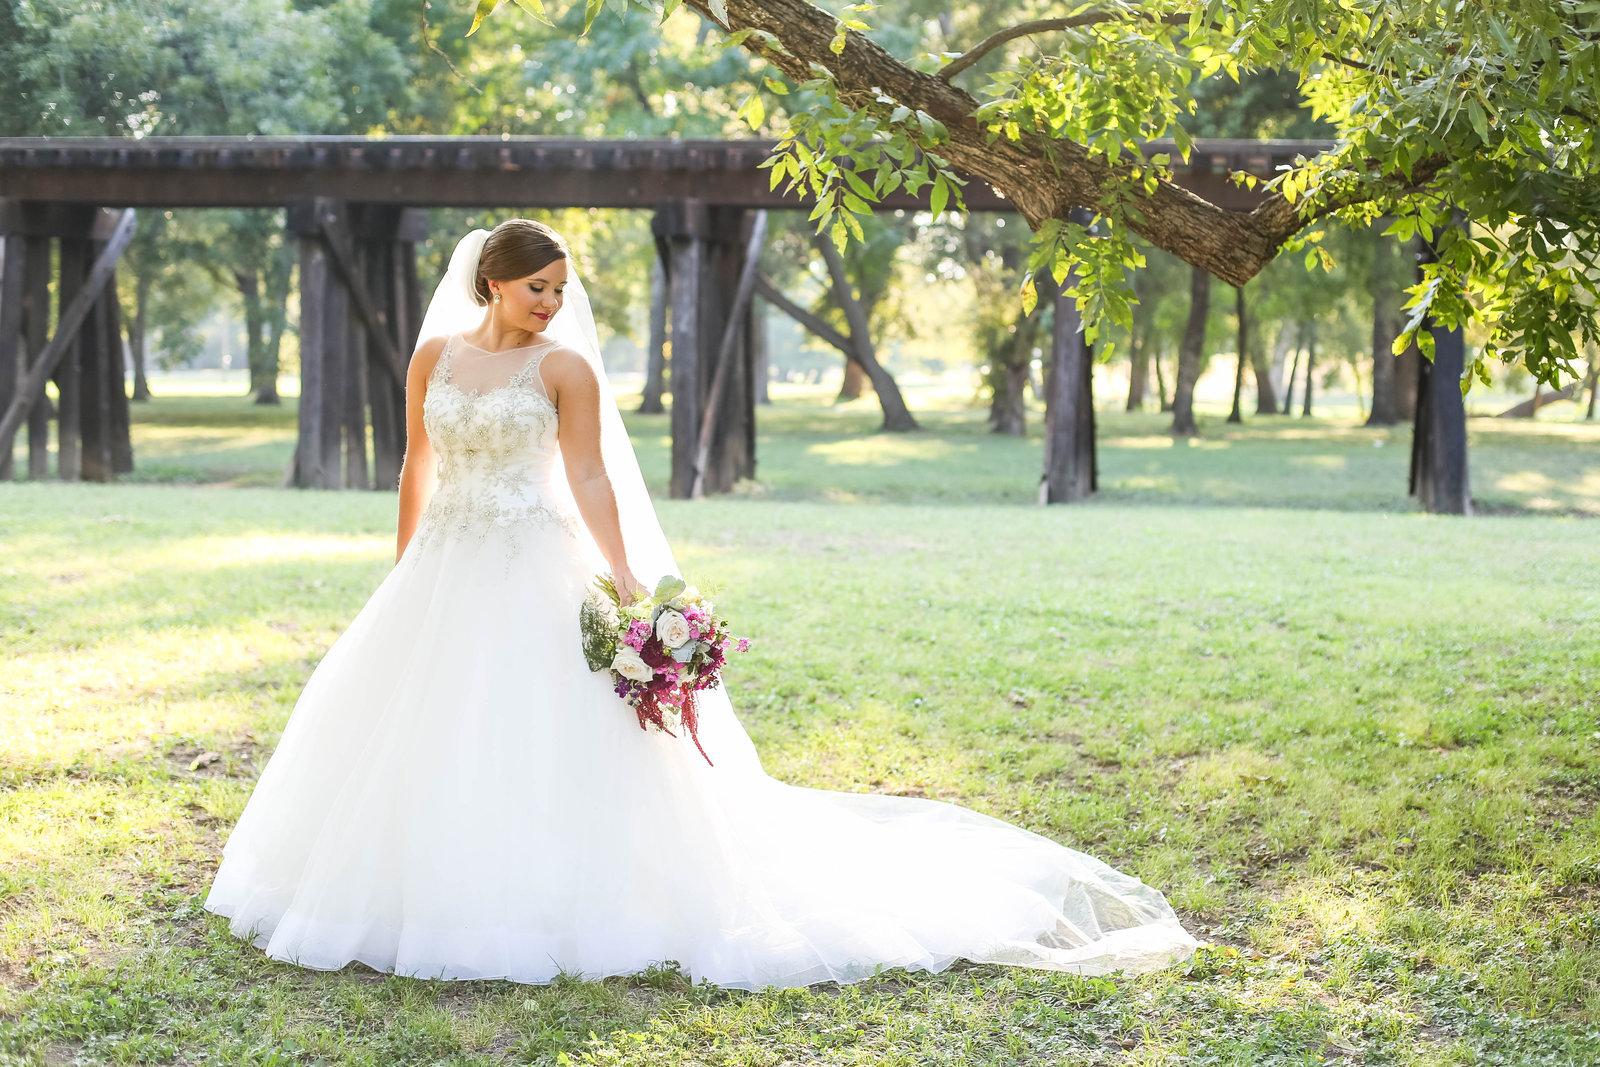 Fort Worth wedding Photographer | Kim Hayes Photography | www.kimhayesphotos.com